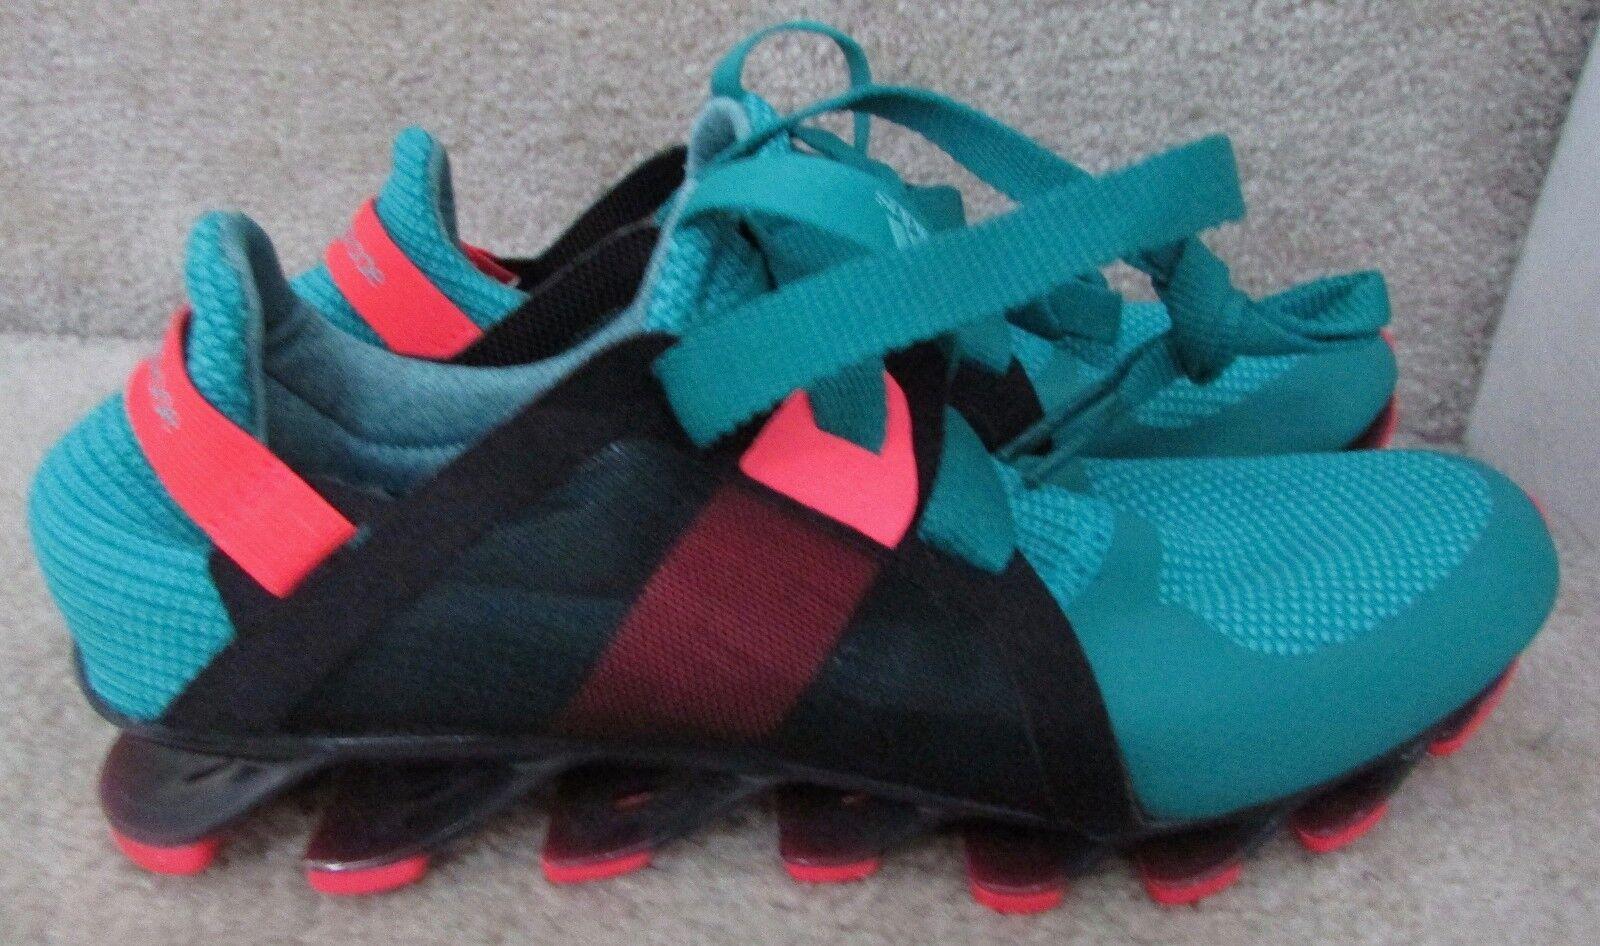 Adidas springblade guidare af5283 till campione 7 di donne scarpe taglia 7 campione d47e4f